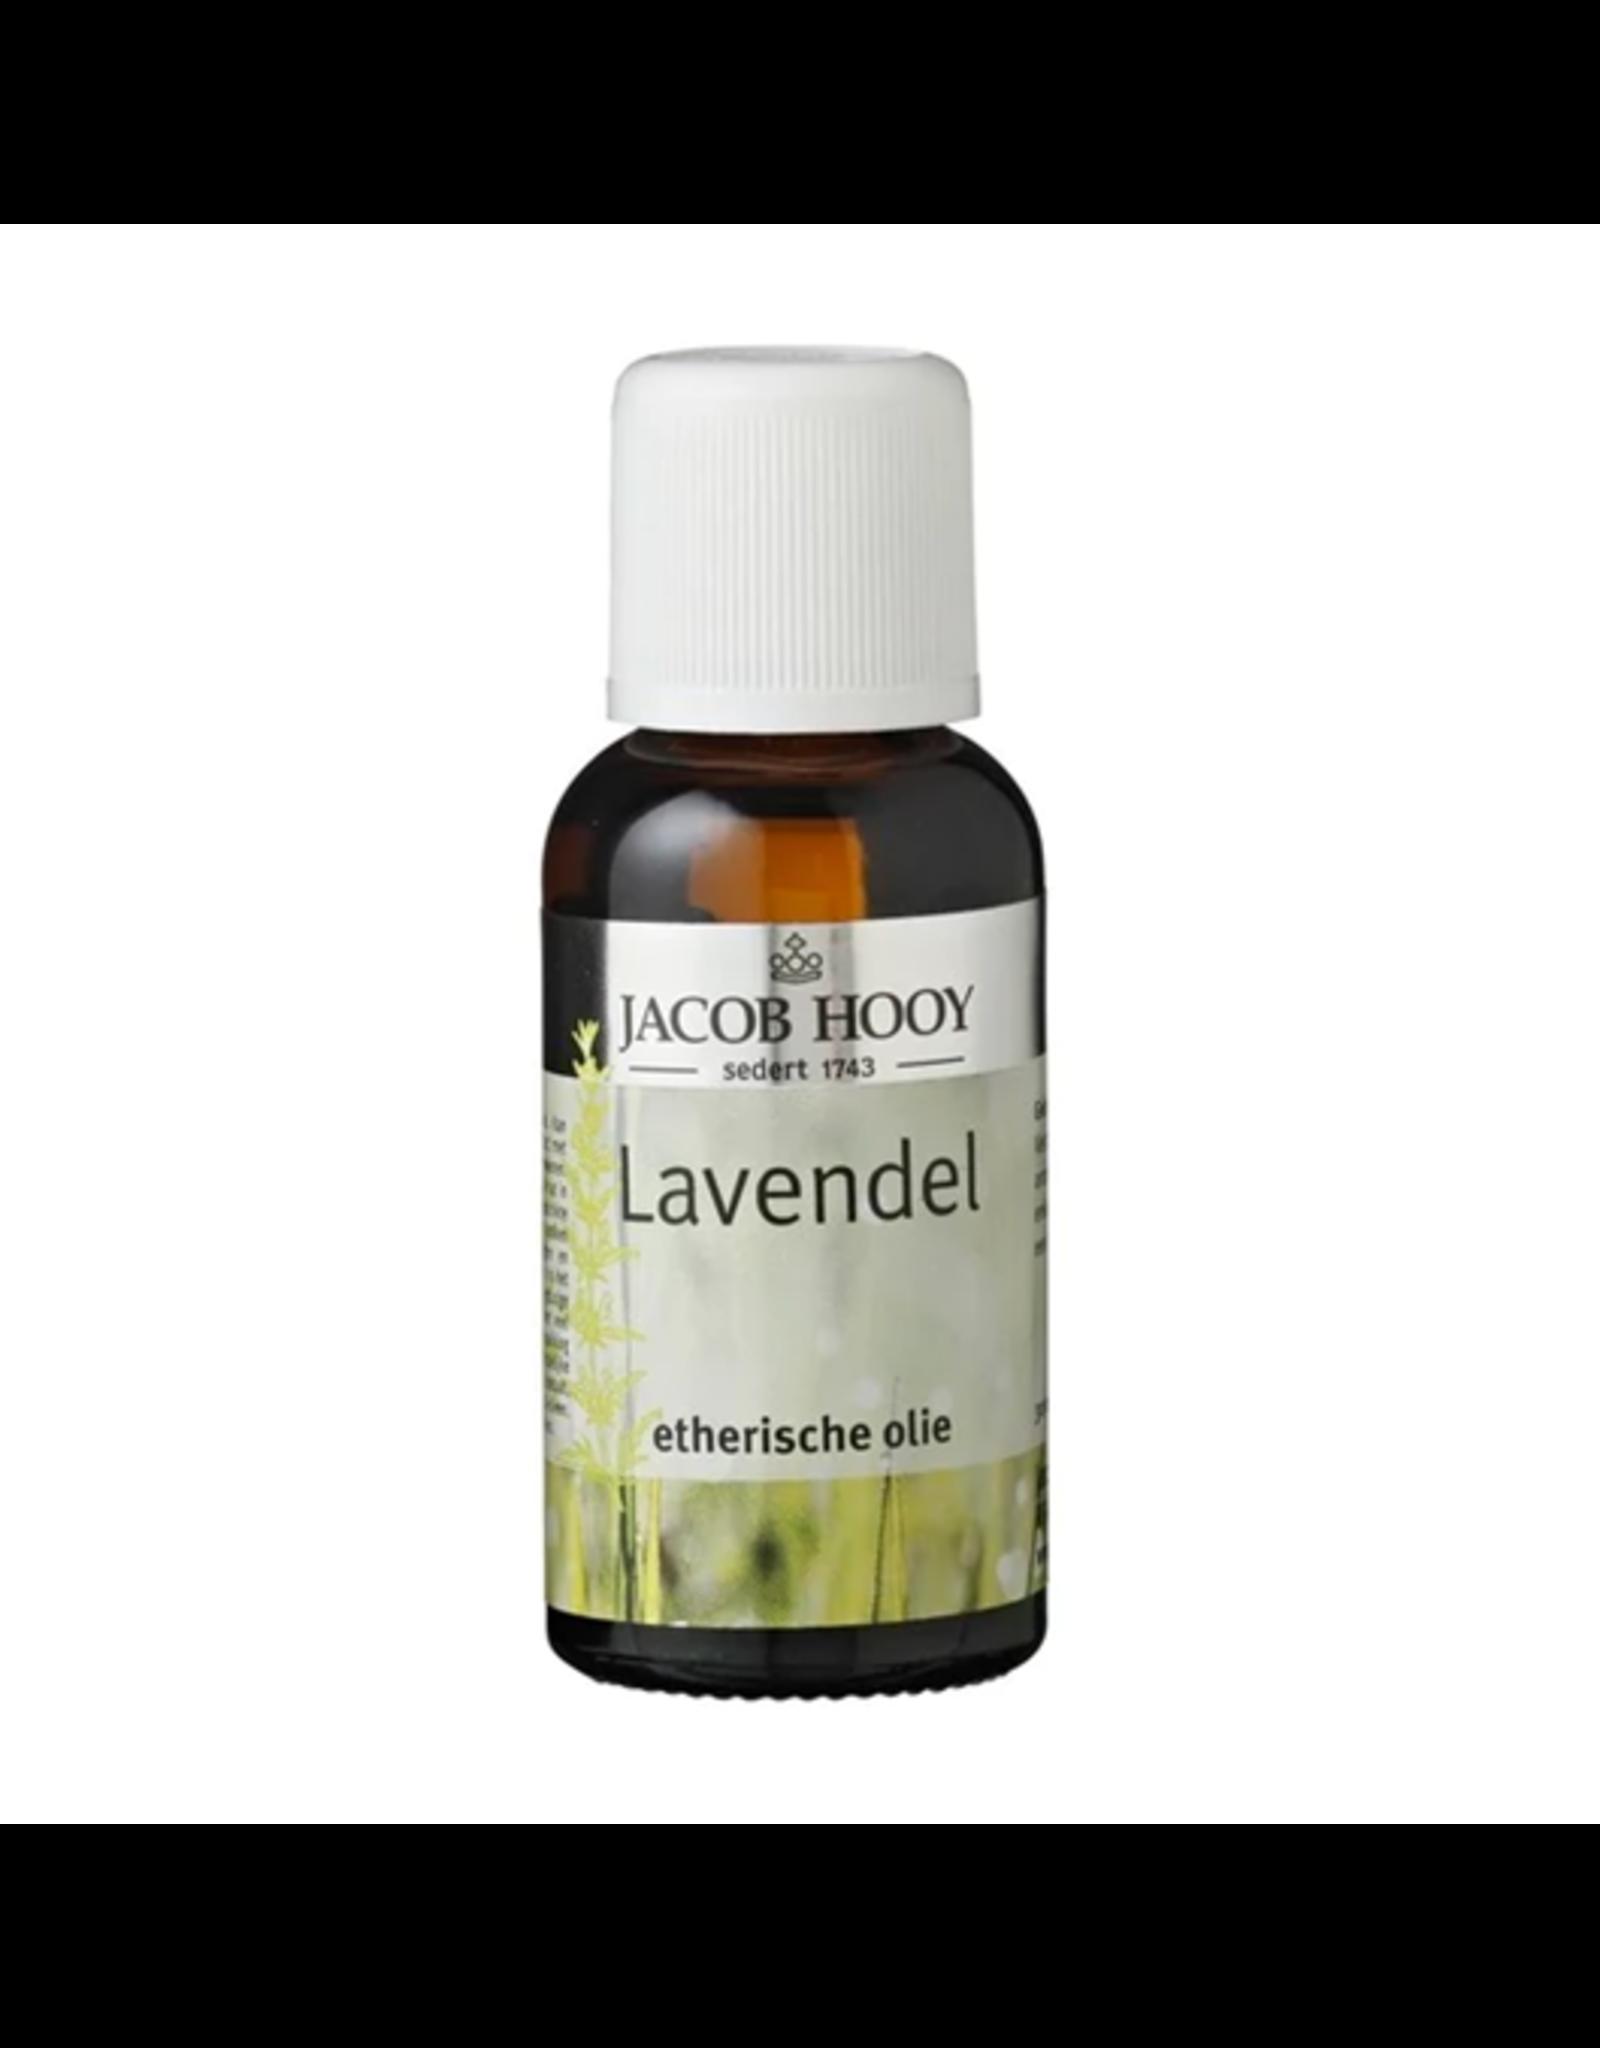 Jacob Hooij Lavendel